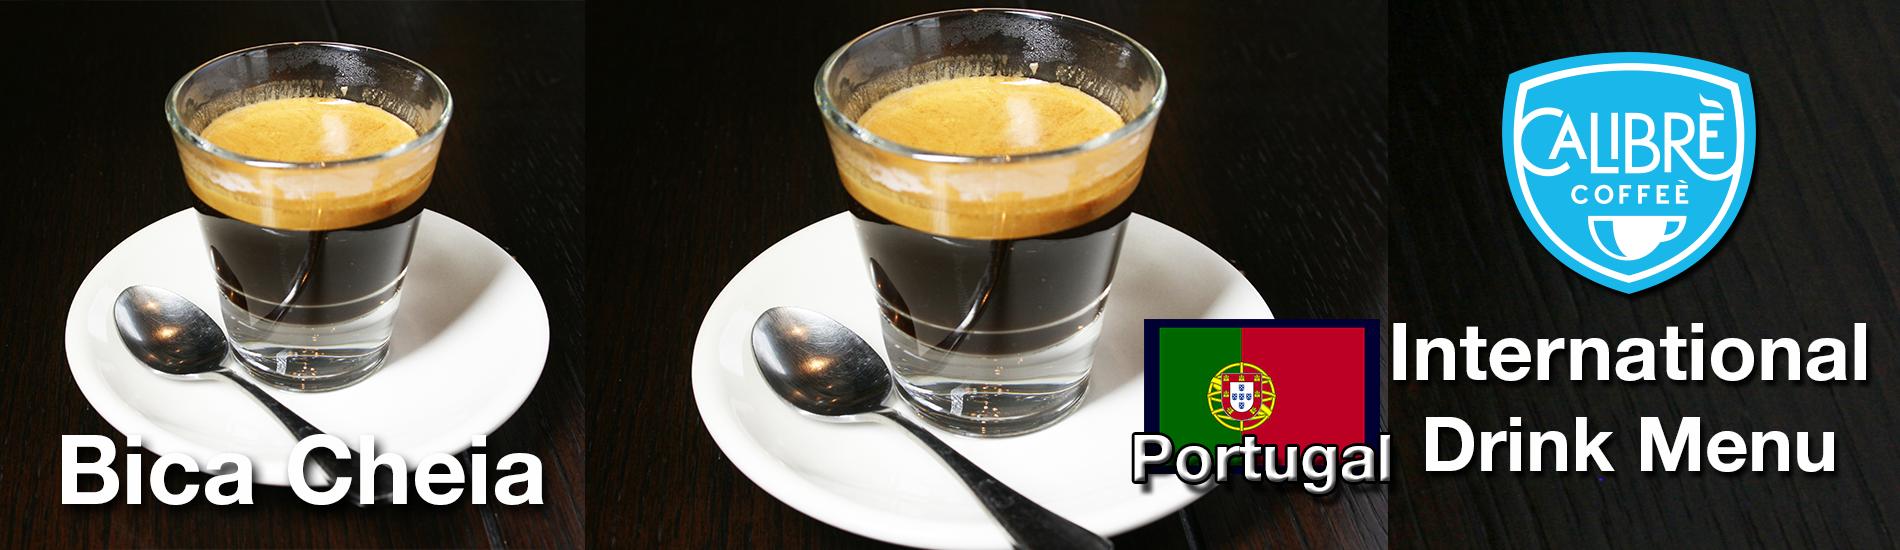 calibre-coffee-slides-international-coffee-BicaCheia2